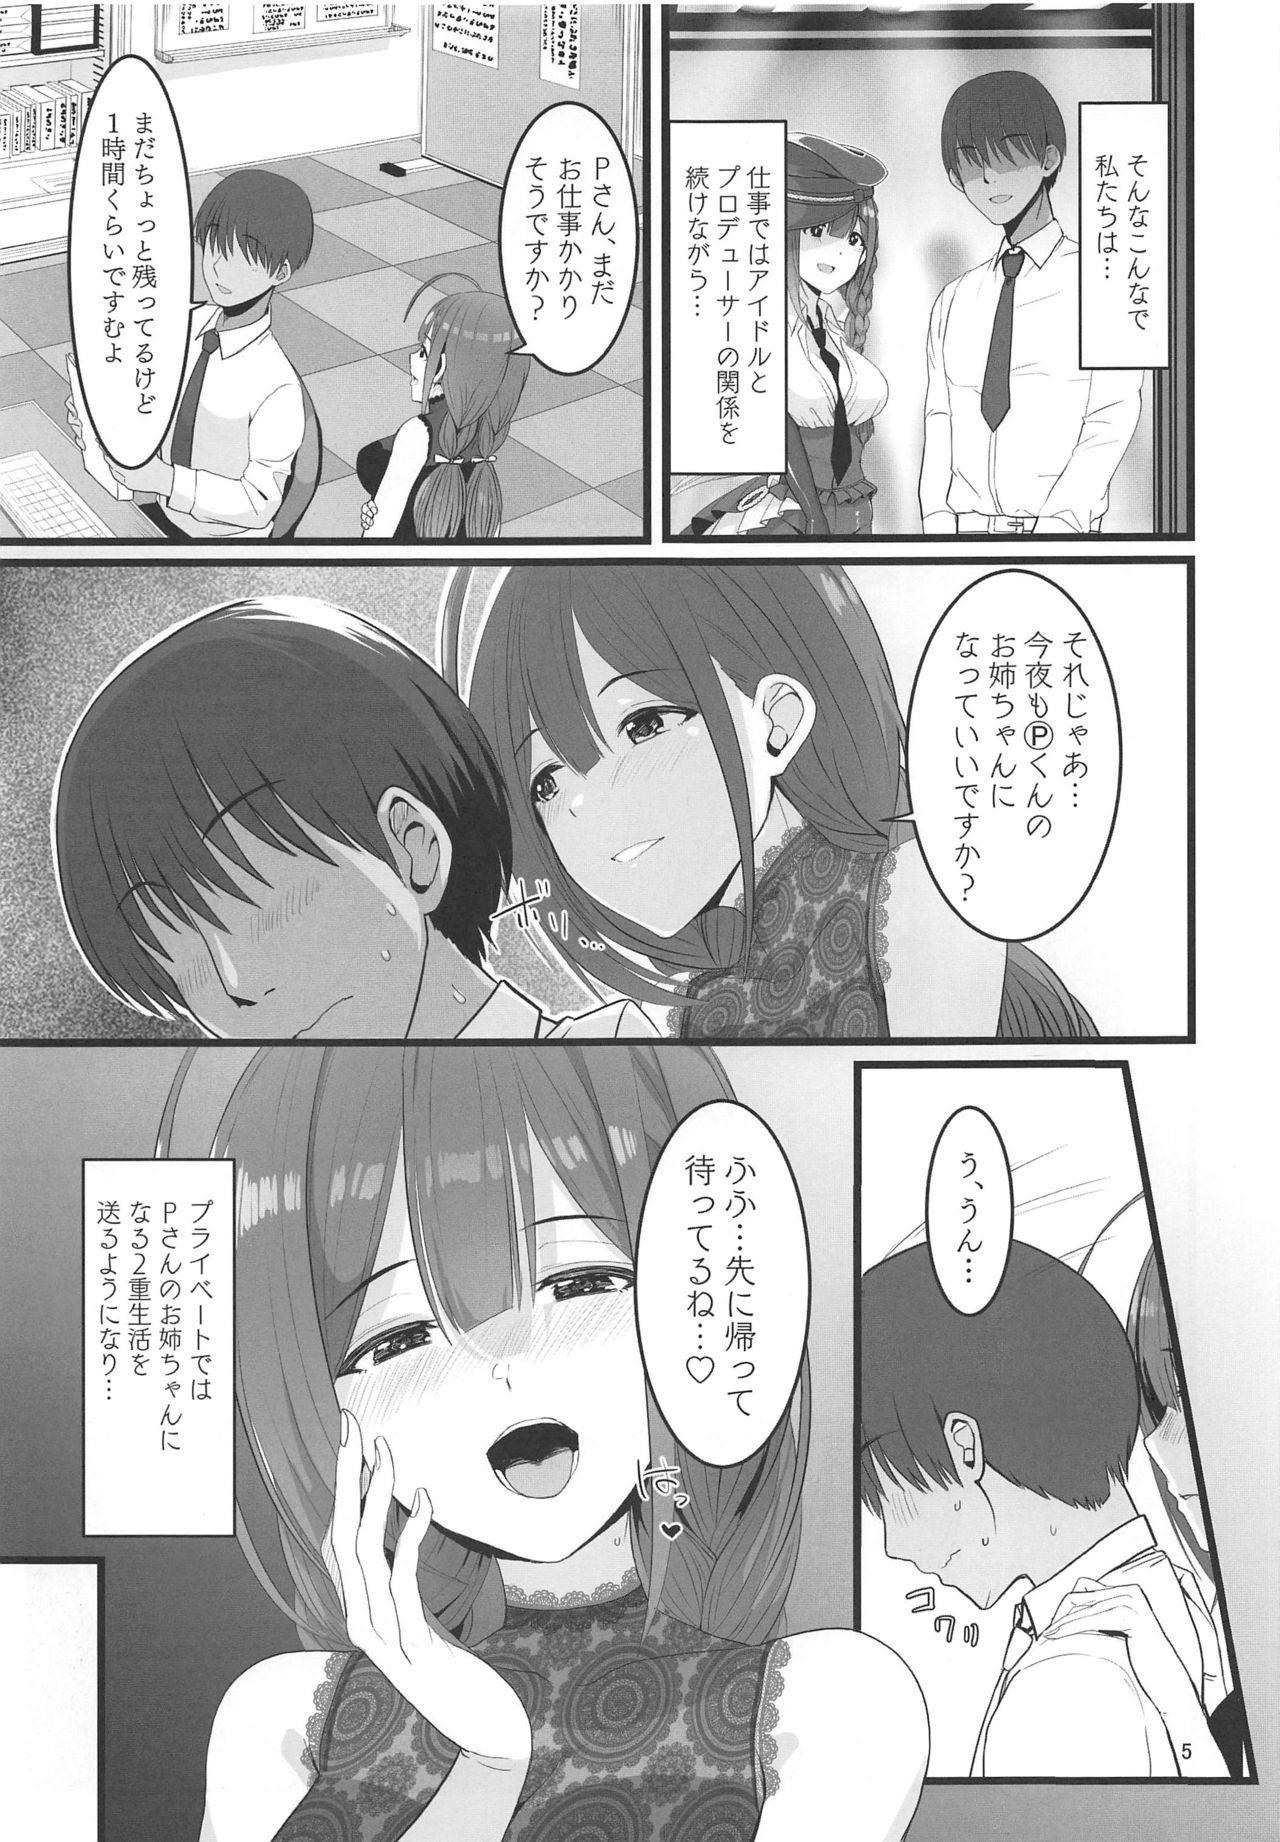 (Utahime Teien 20) [UPA24 (Upanishi.)] Watashi... P-san no H na Onee-chan ni Narimasu (THE iDOLM@STER: Shiny Colors) 5